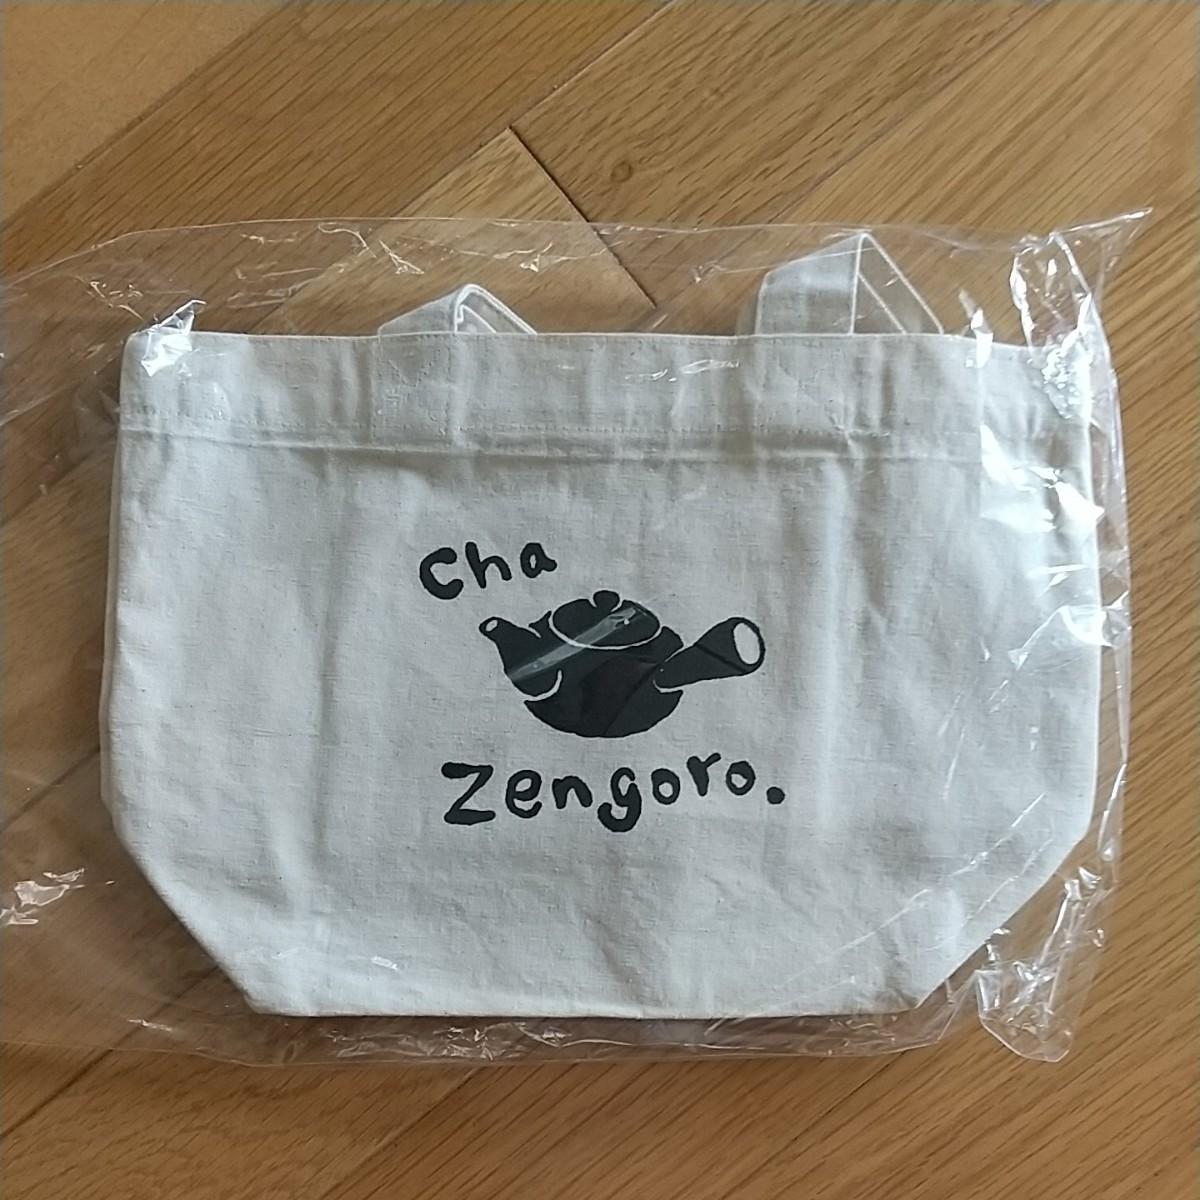 cha    zengoro.オリジナルトートバッグ